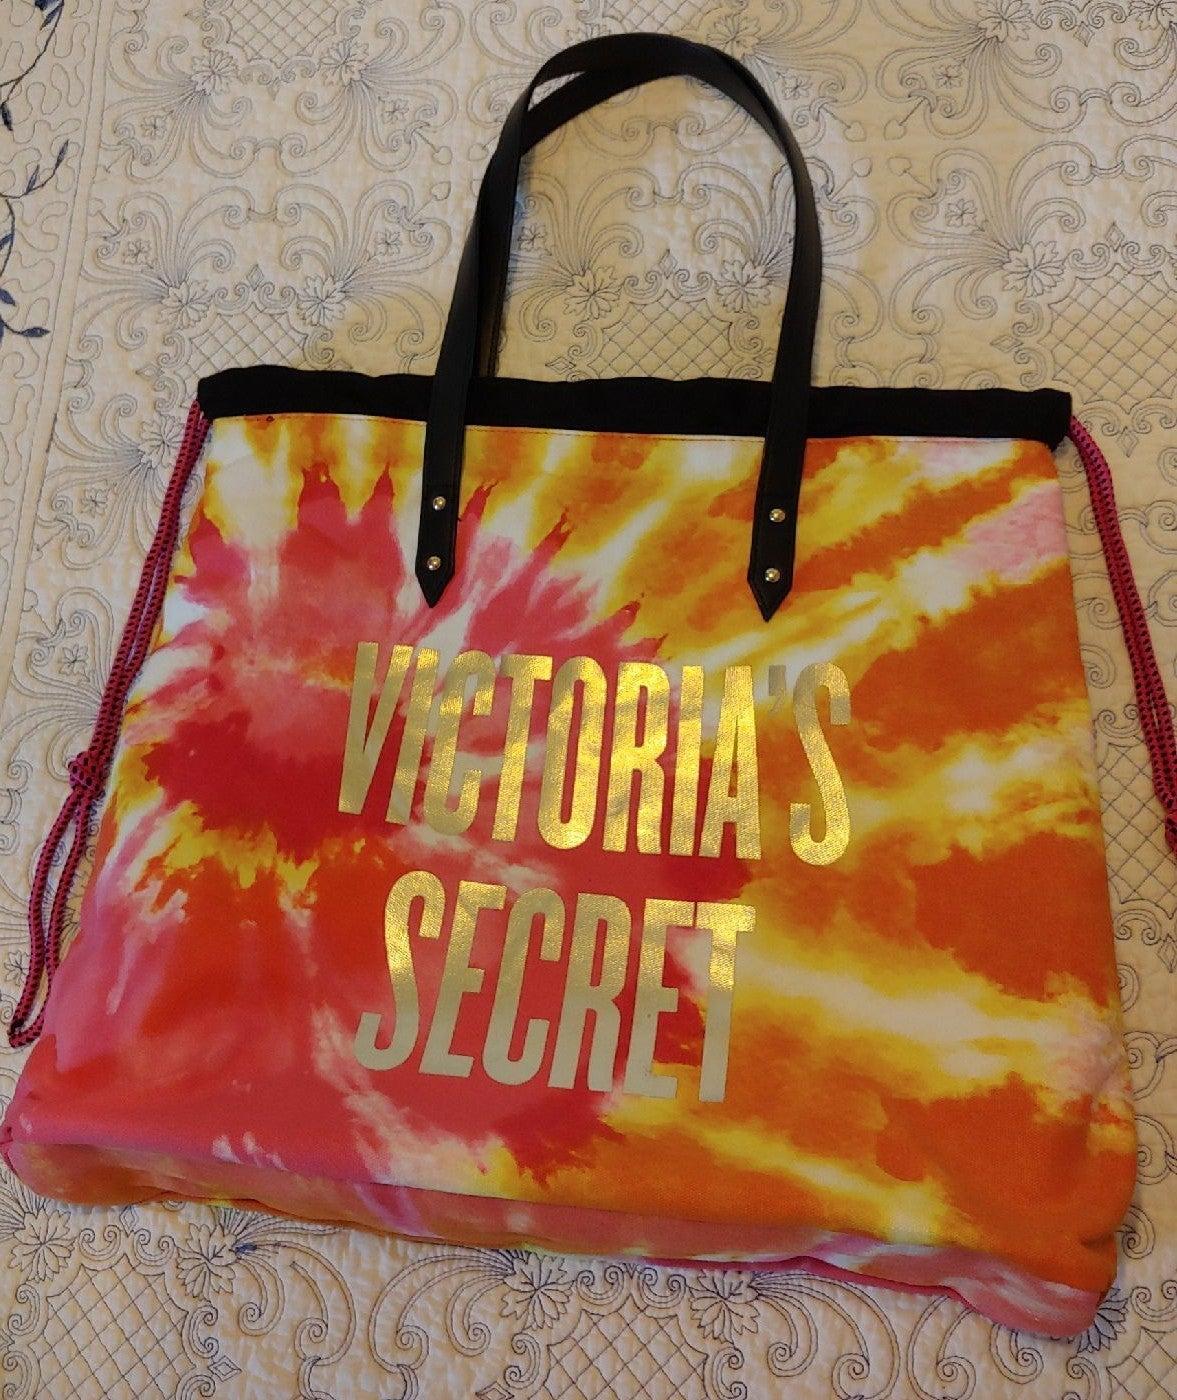 Love Victoria Tropical tote bag